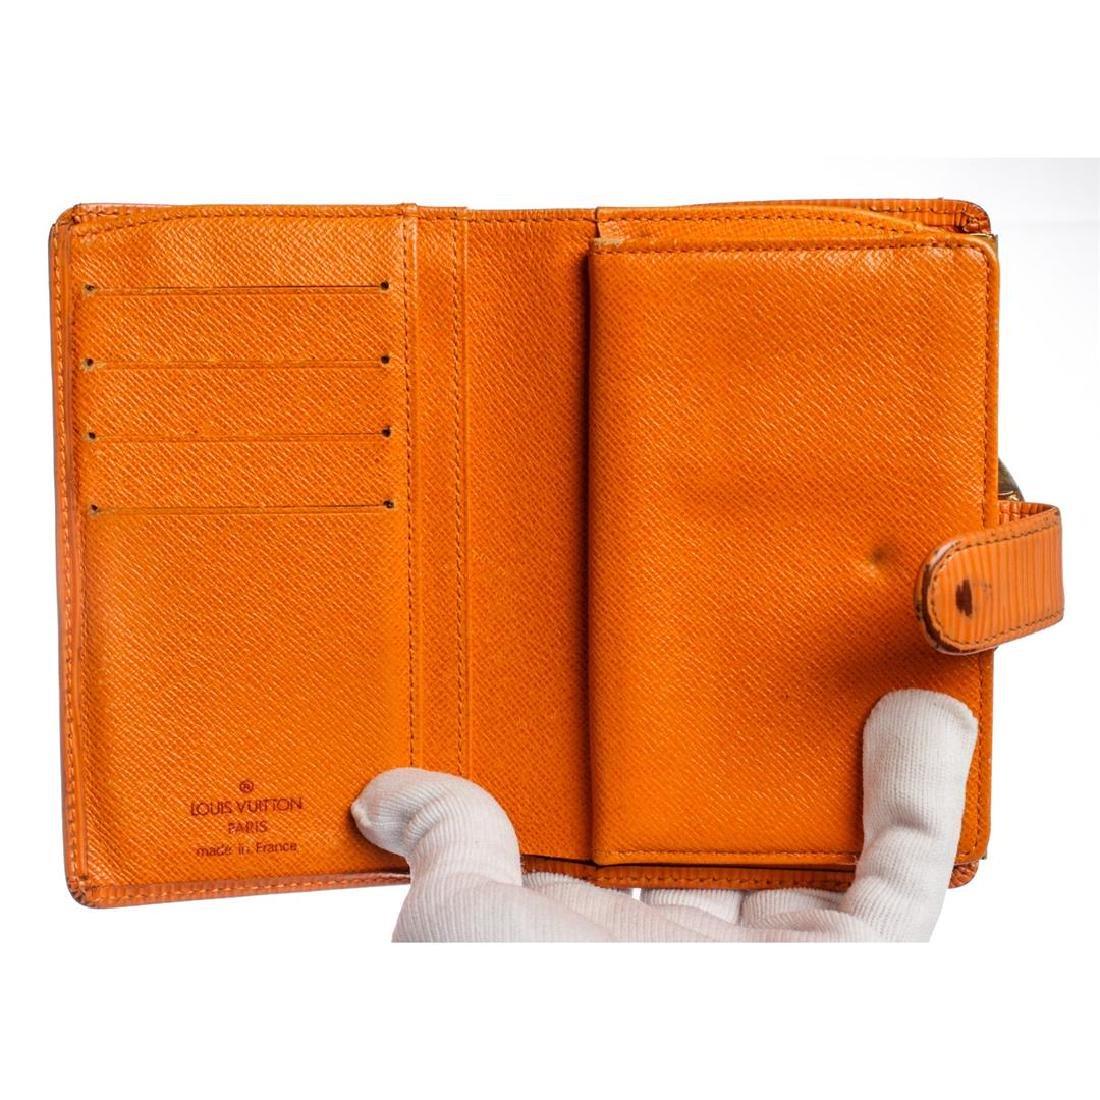 Louis Vuitton Orange Epi Leather French Purse Wallet - 8